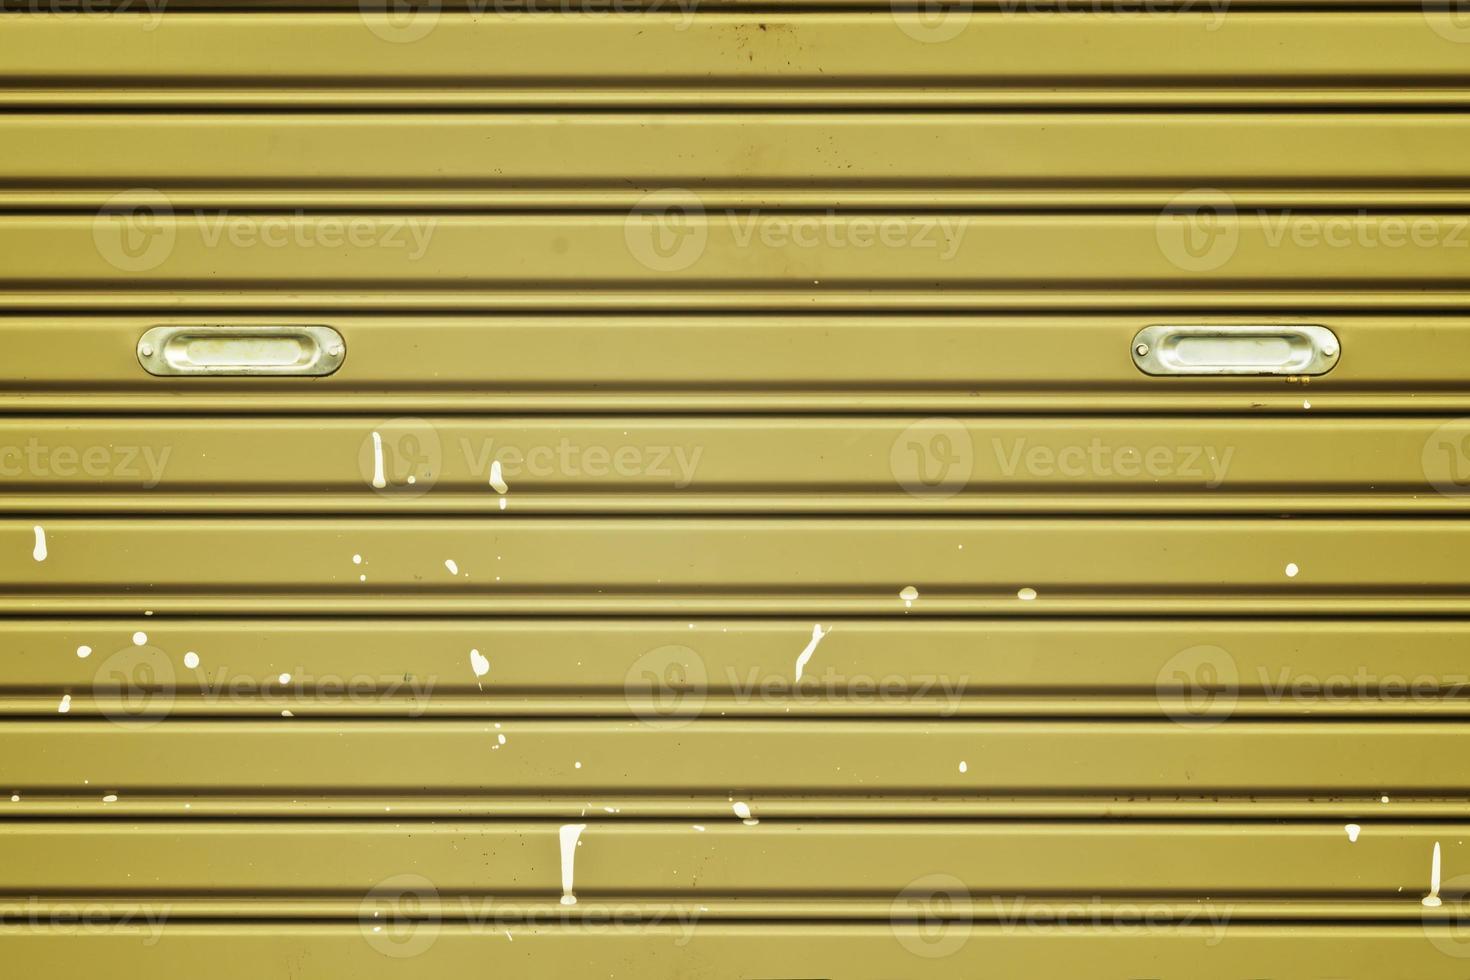 Dirty corrugated metal sheet slide door photo